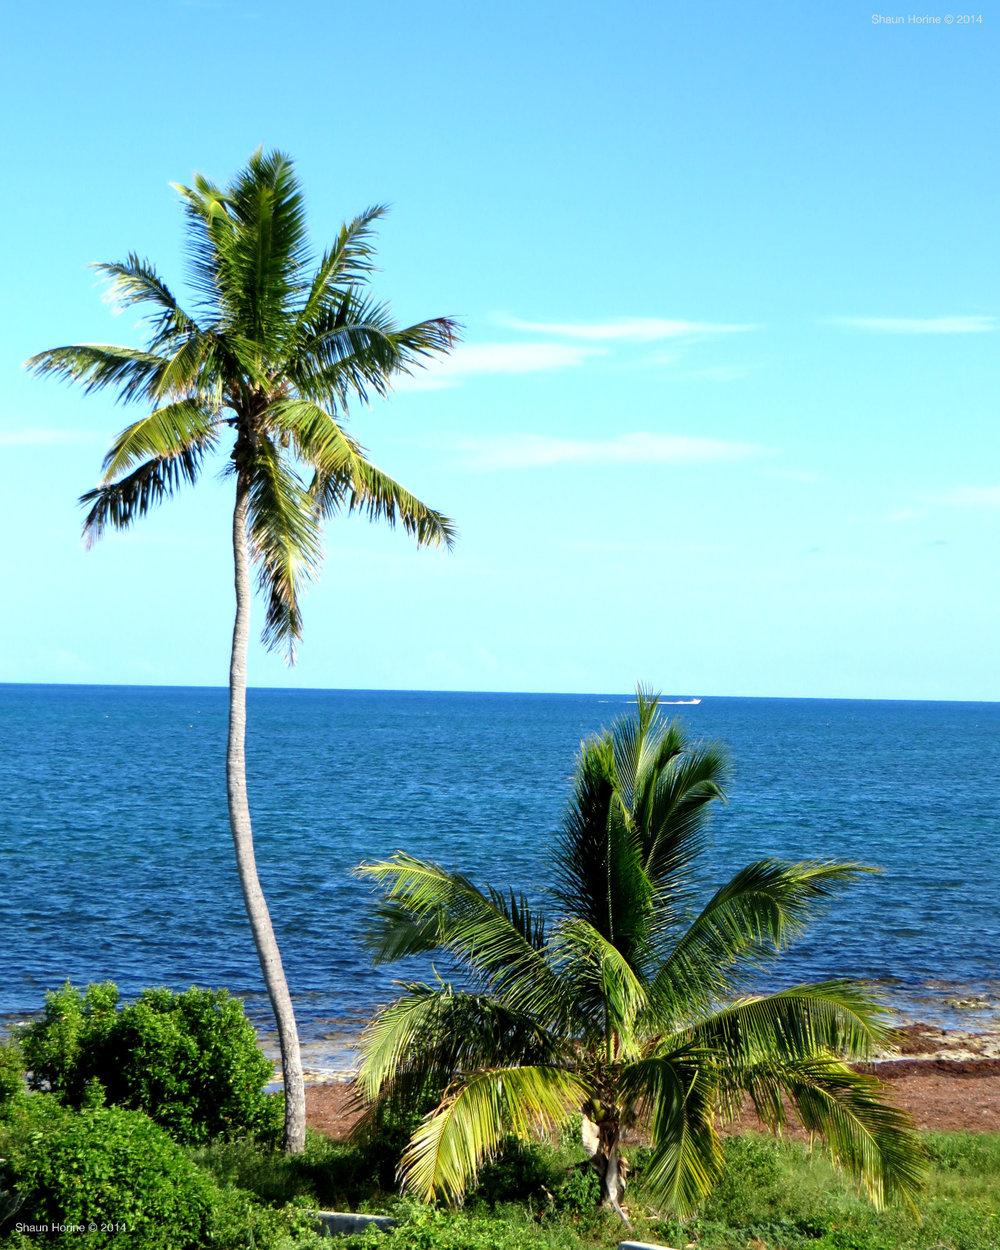 Ocean view near Big Pine Key, FL.